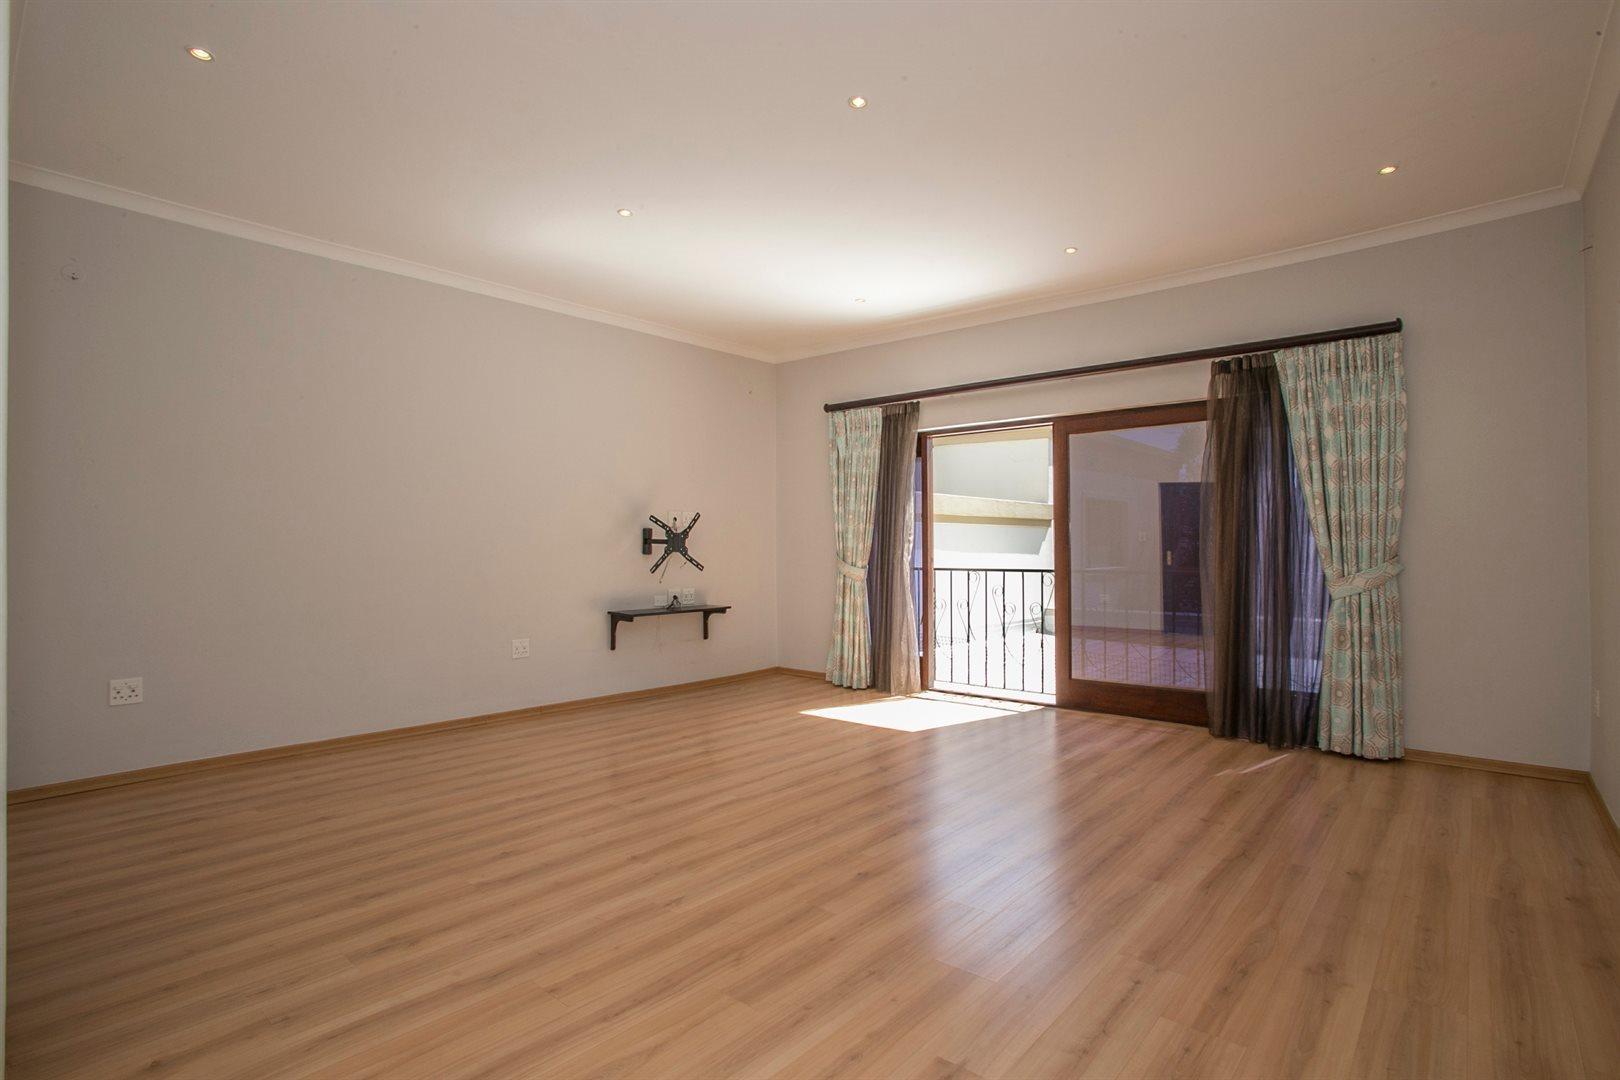 Dainfern Golf Estate property for sale. Ref No: 13381182. Picture no 6